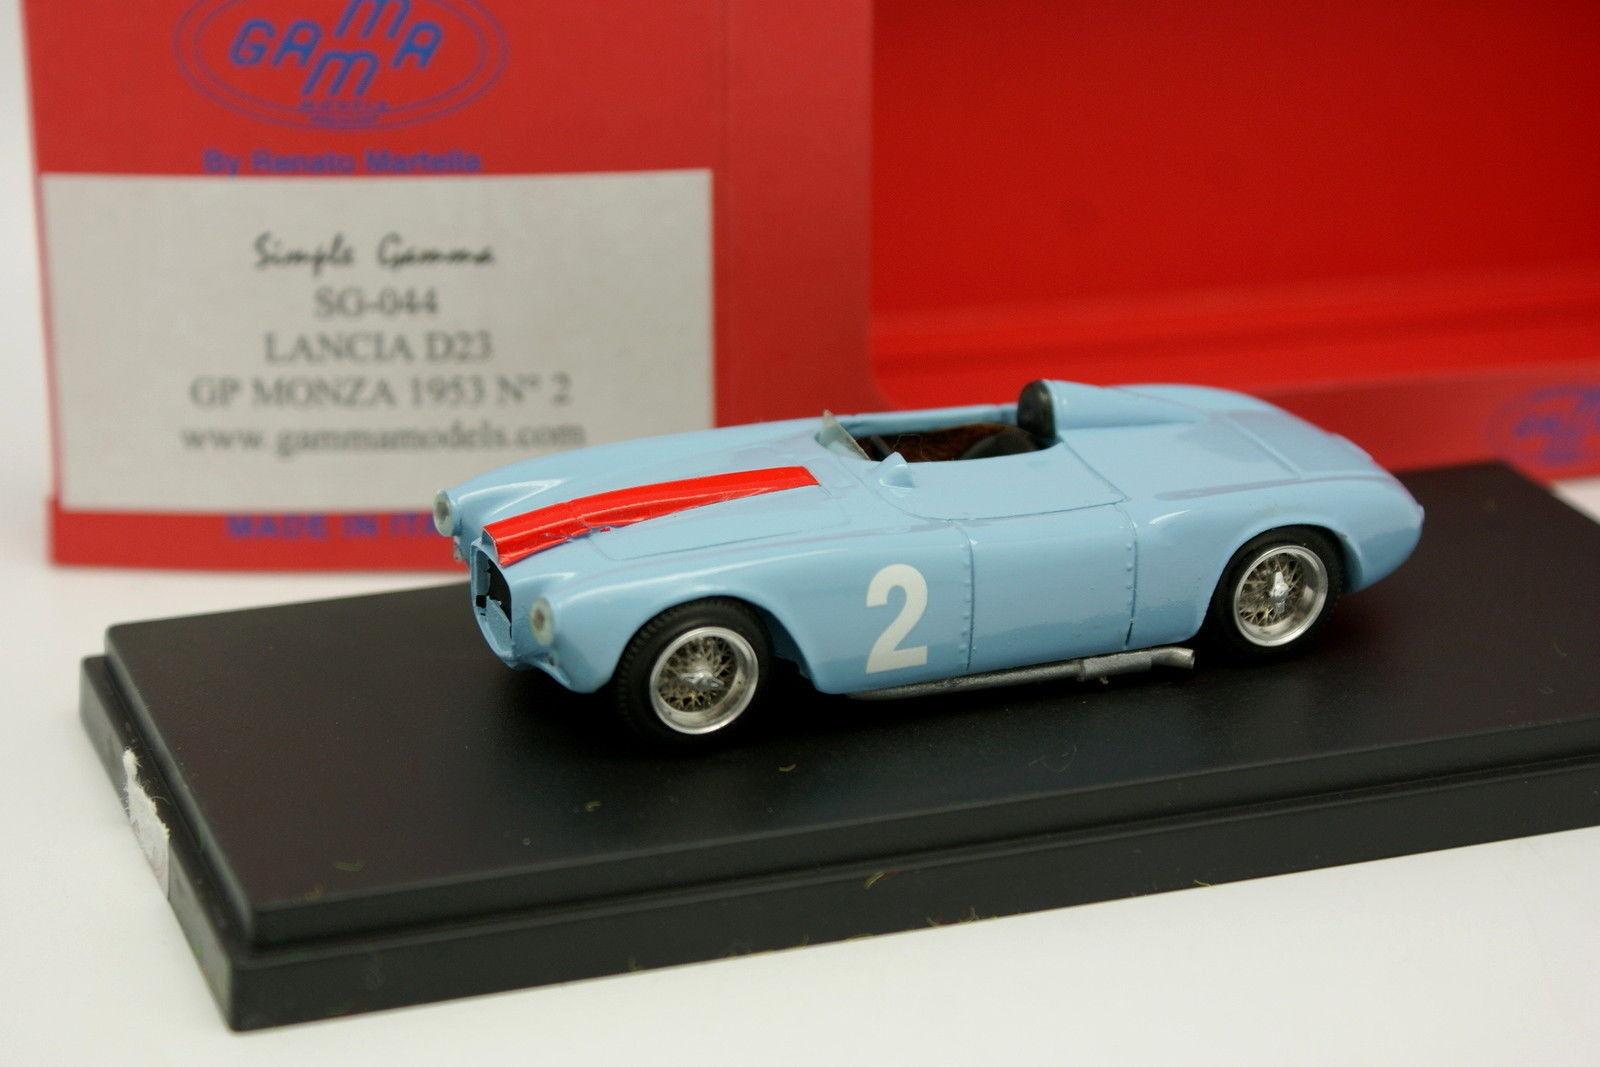 Gamma 1 43 - Lancia D23 Monza GP 1953 n°2